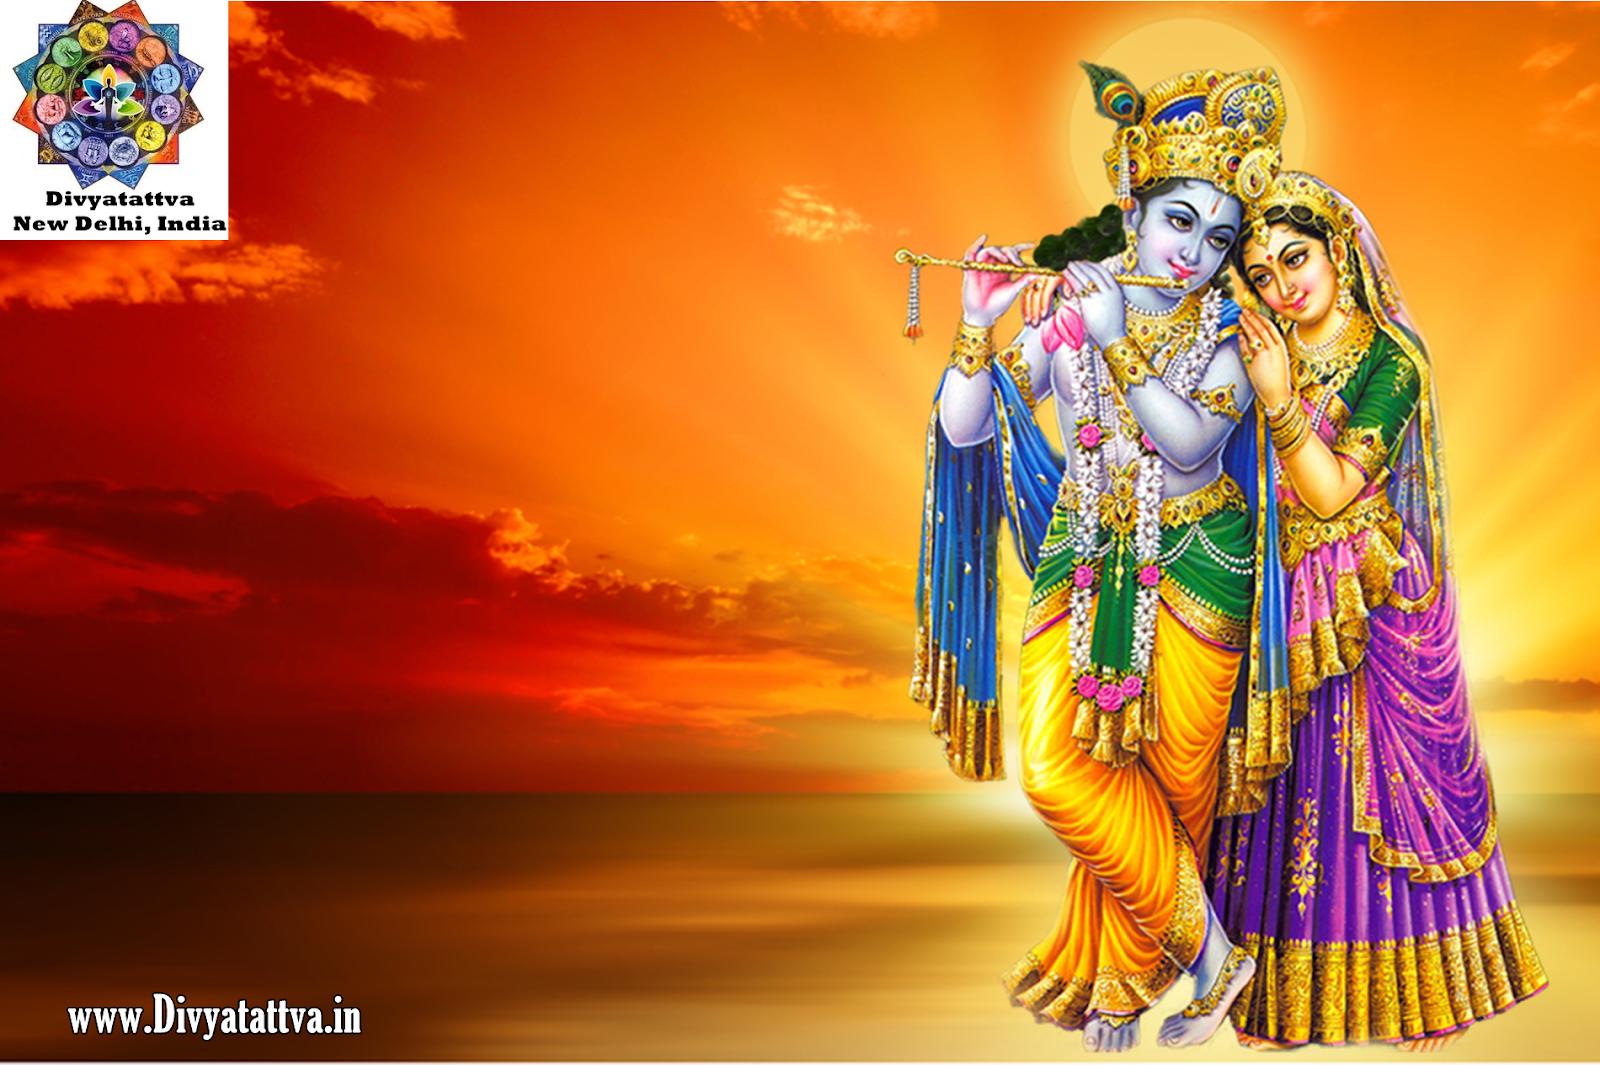 divyatattva astrology free horoscopes psychic tarot yoga tantra occult images videos sri krishna ultra hd wallpaper 4k spiritual images background of hindu gods sri krishna ultra hd wallpaper 4k